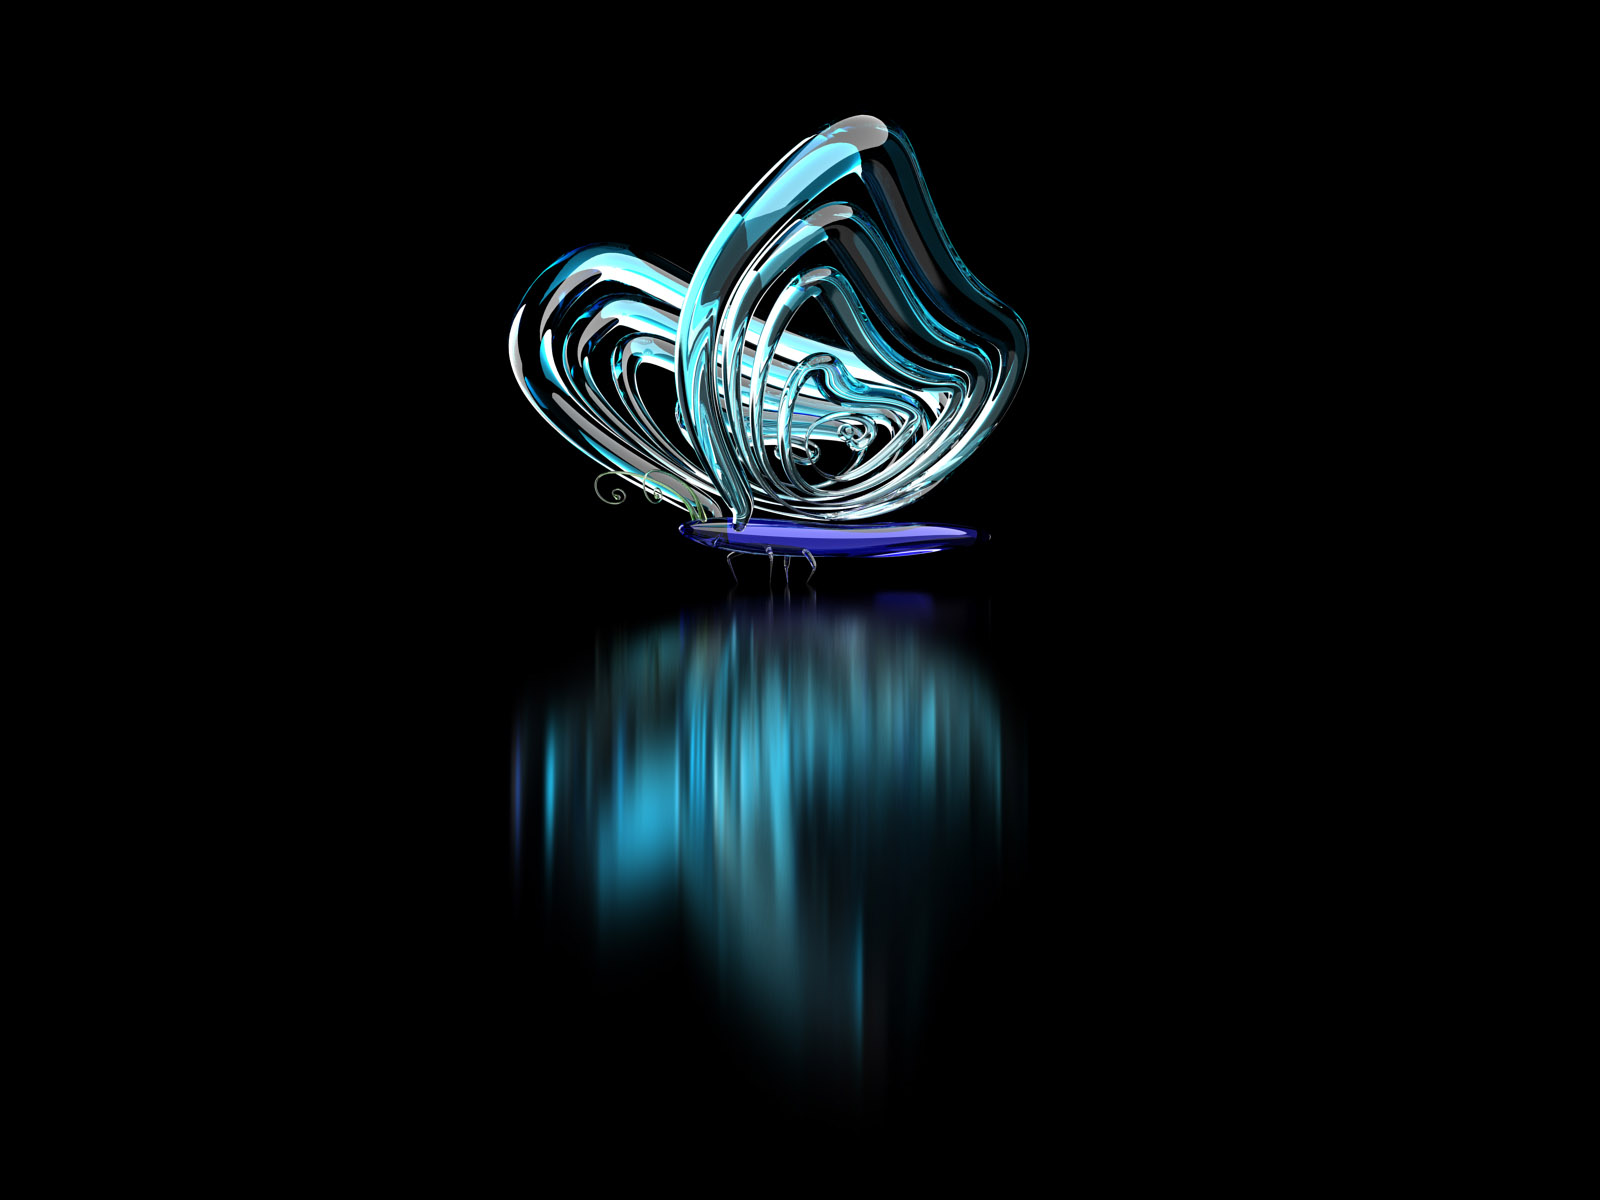 3D Butterfly Reflection Normal HD Wallpaper